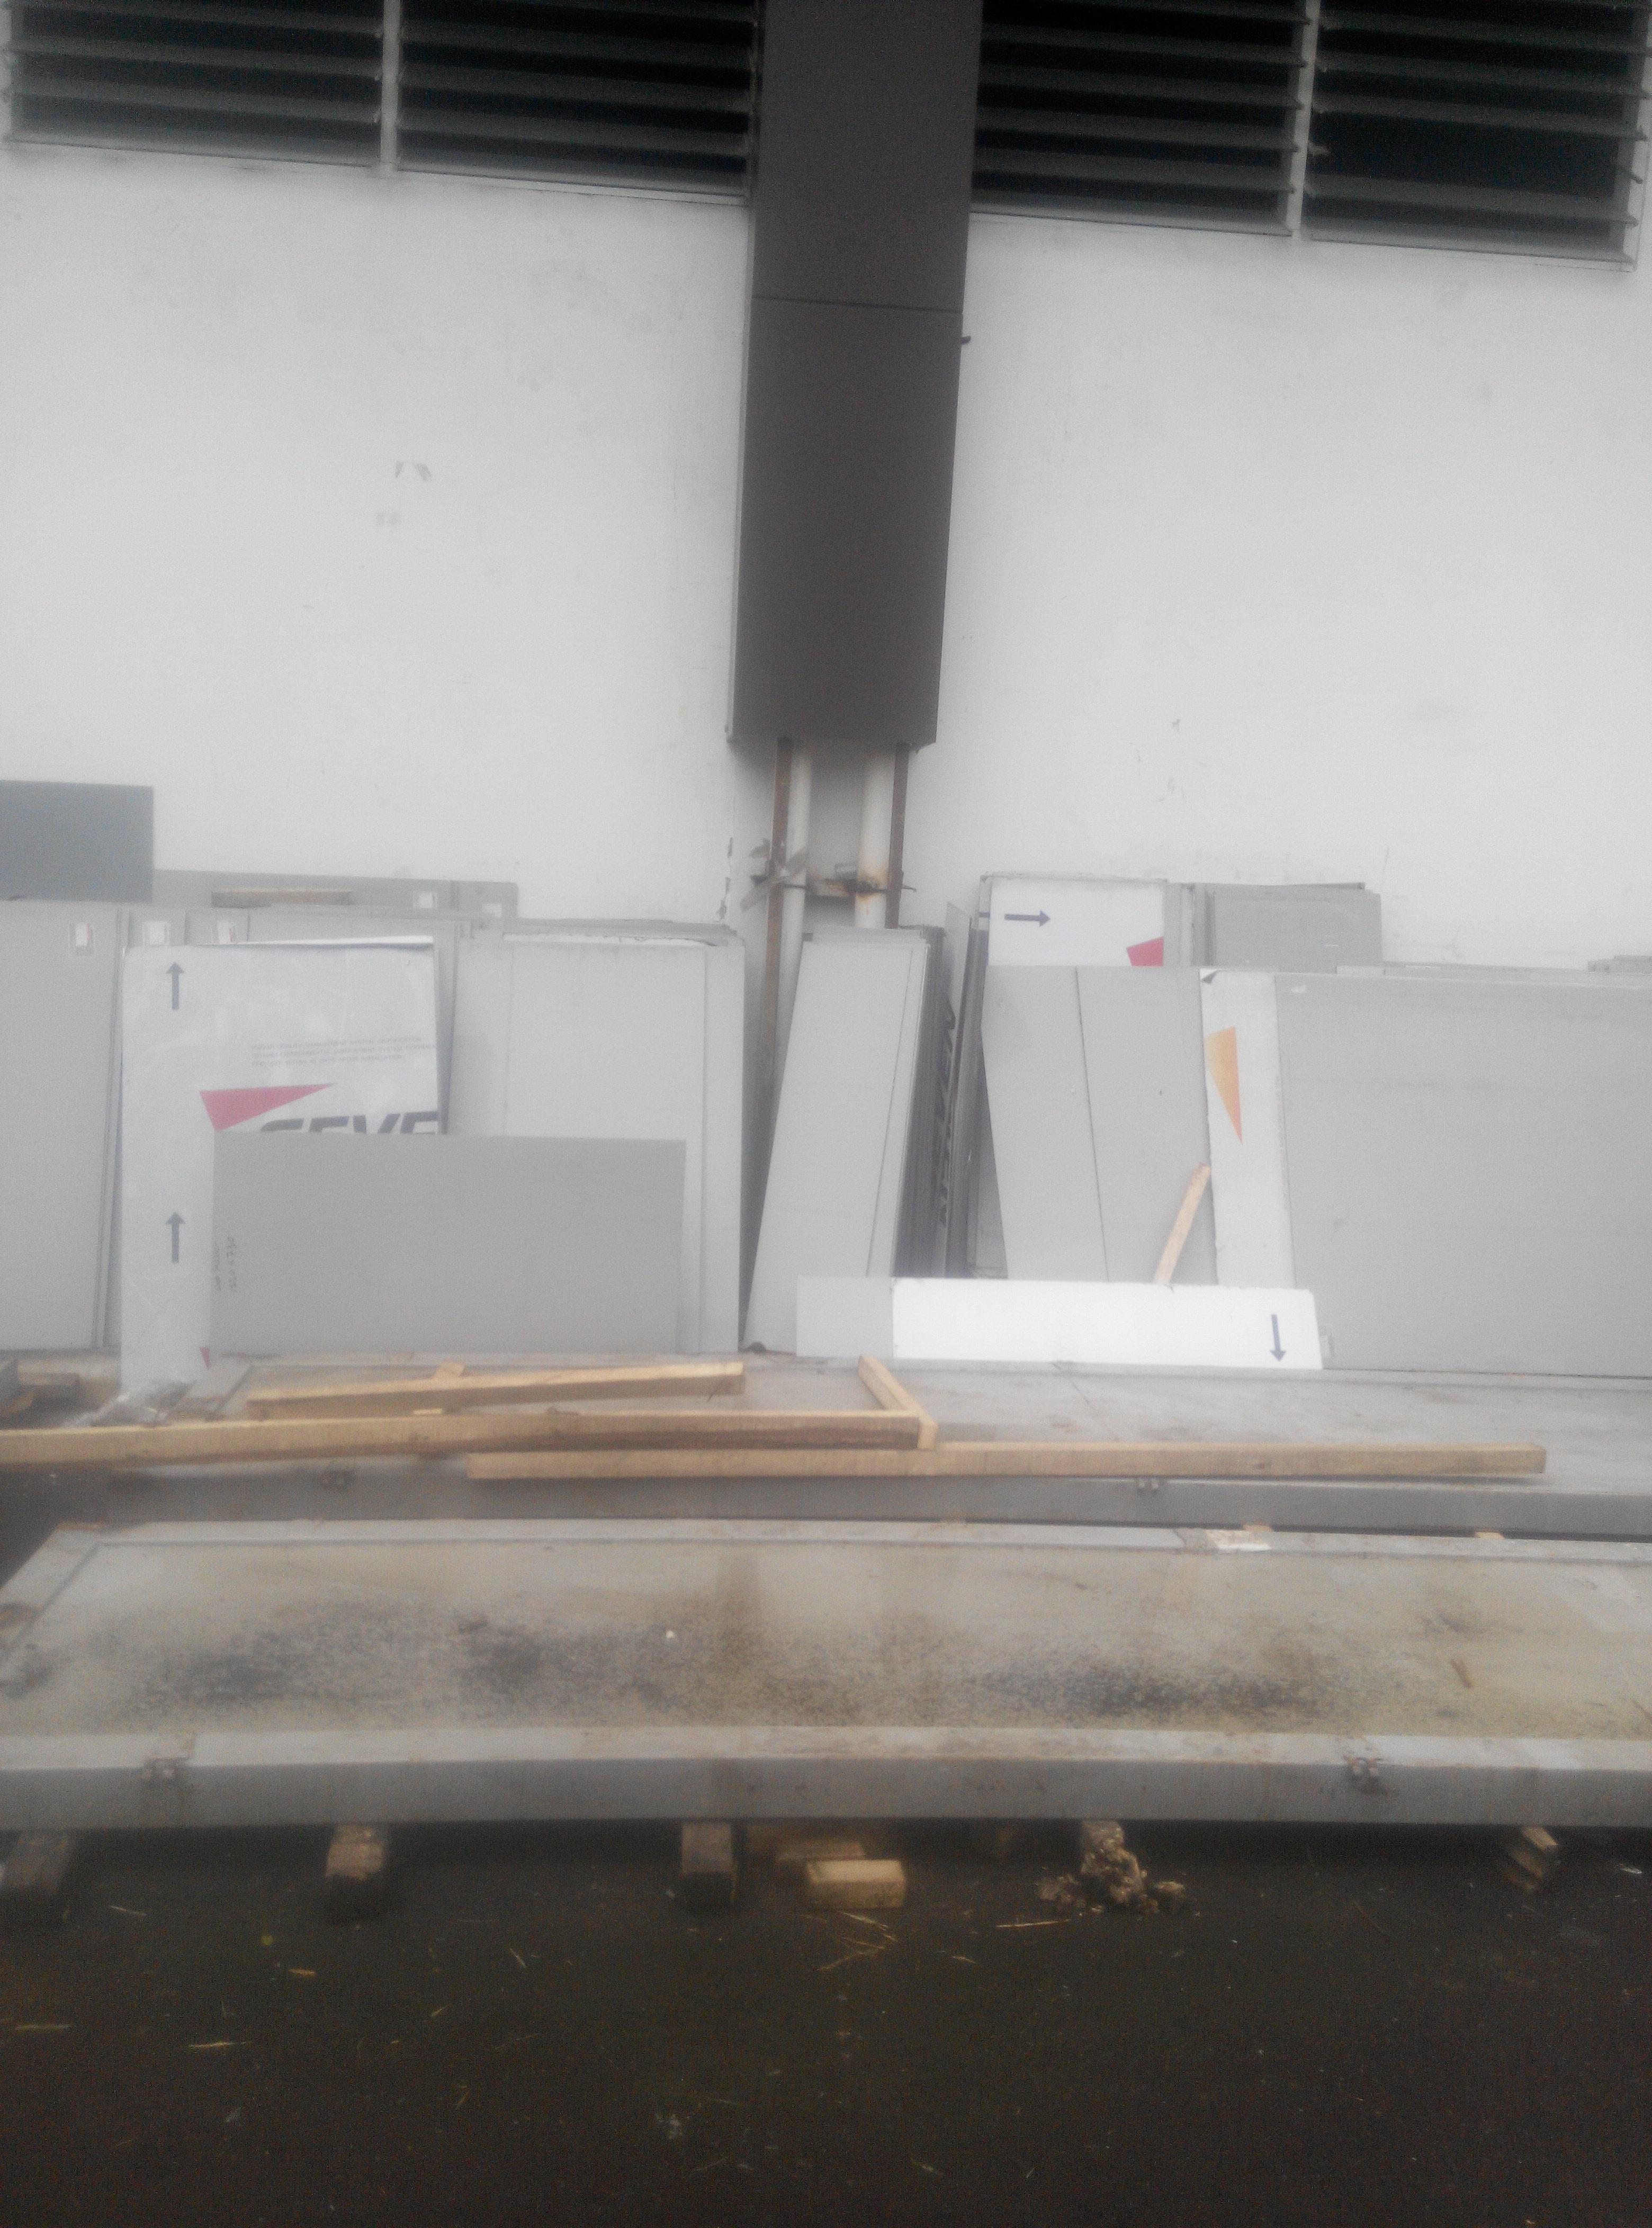 Jual Seven Aluminium Composite Panel potongan cutting size